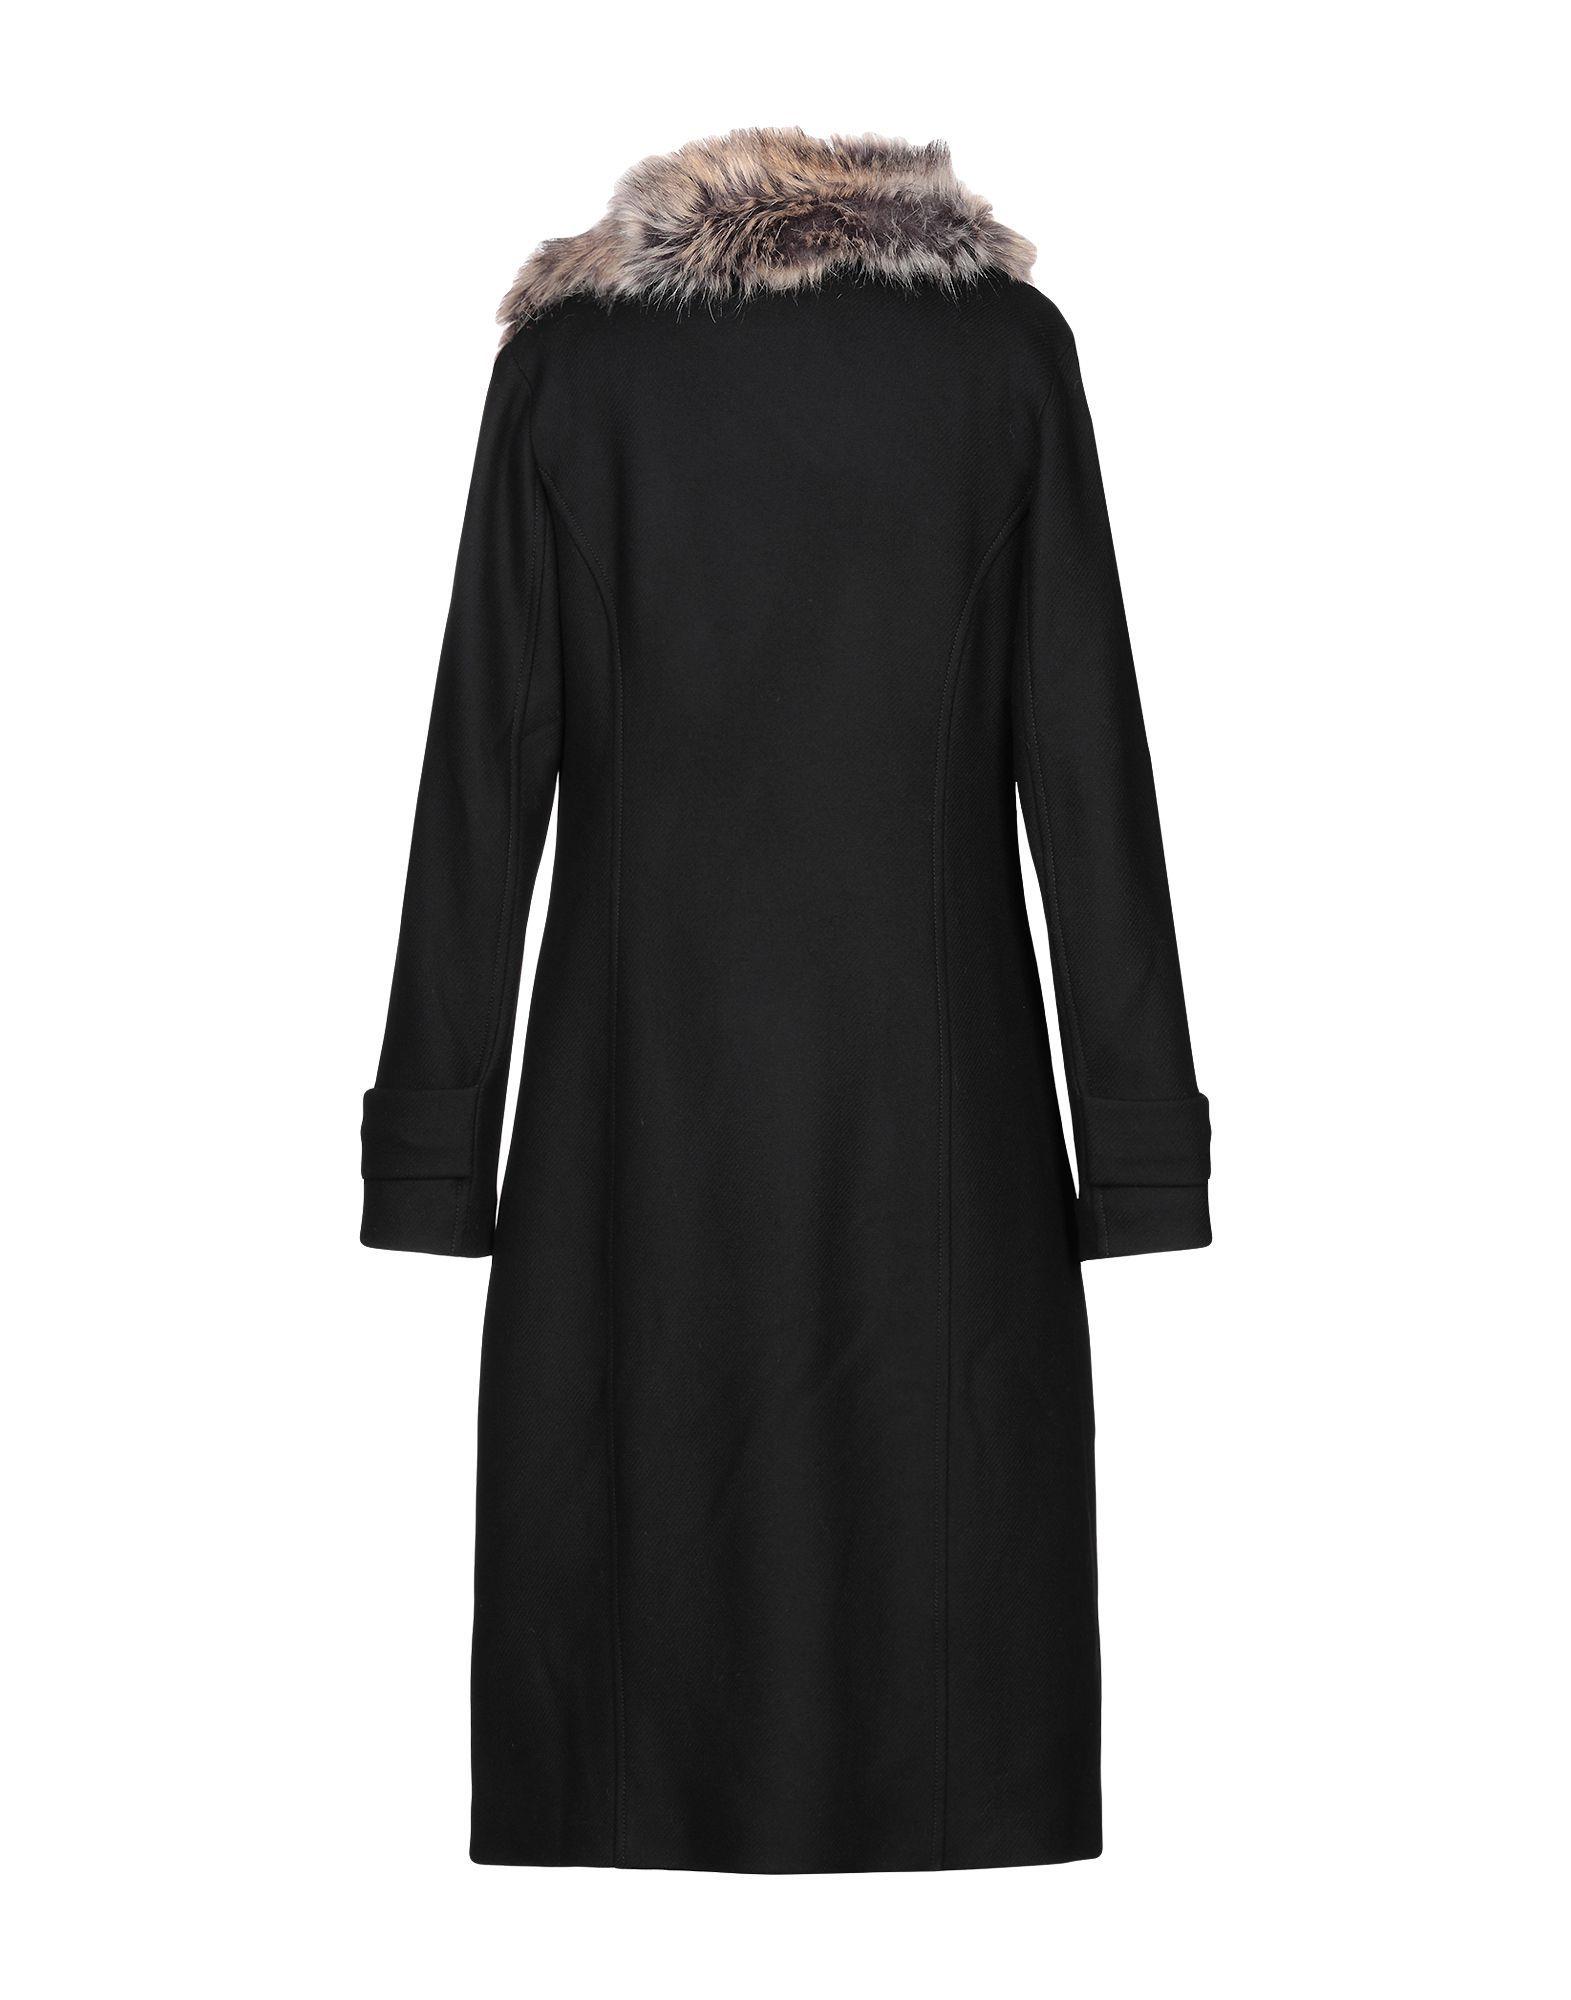 Pinko Black Wool And Faux Fur Coat